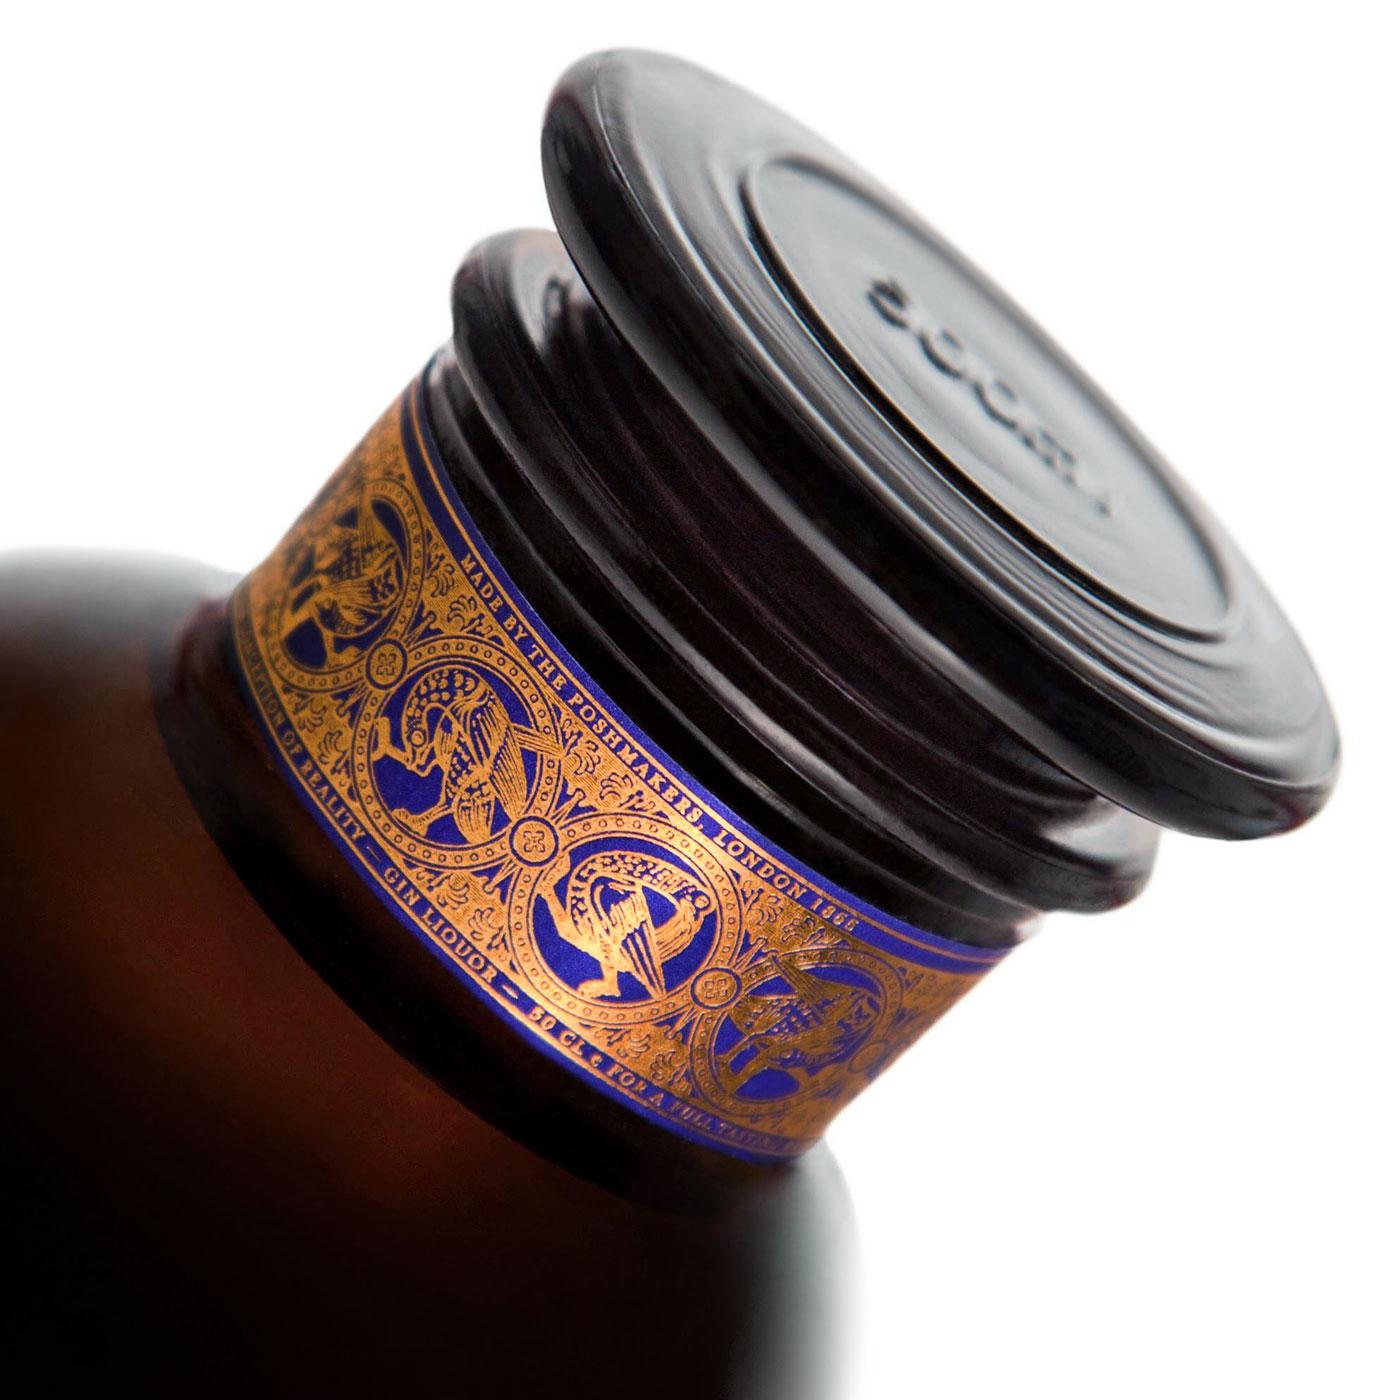 Diseño de ginebras premium